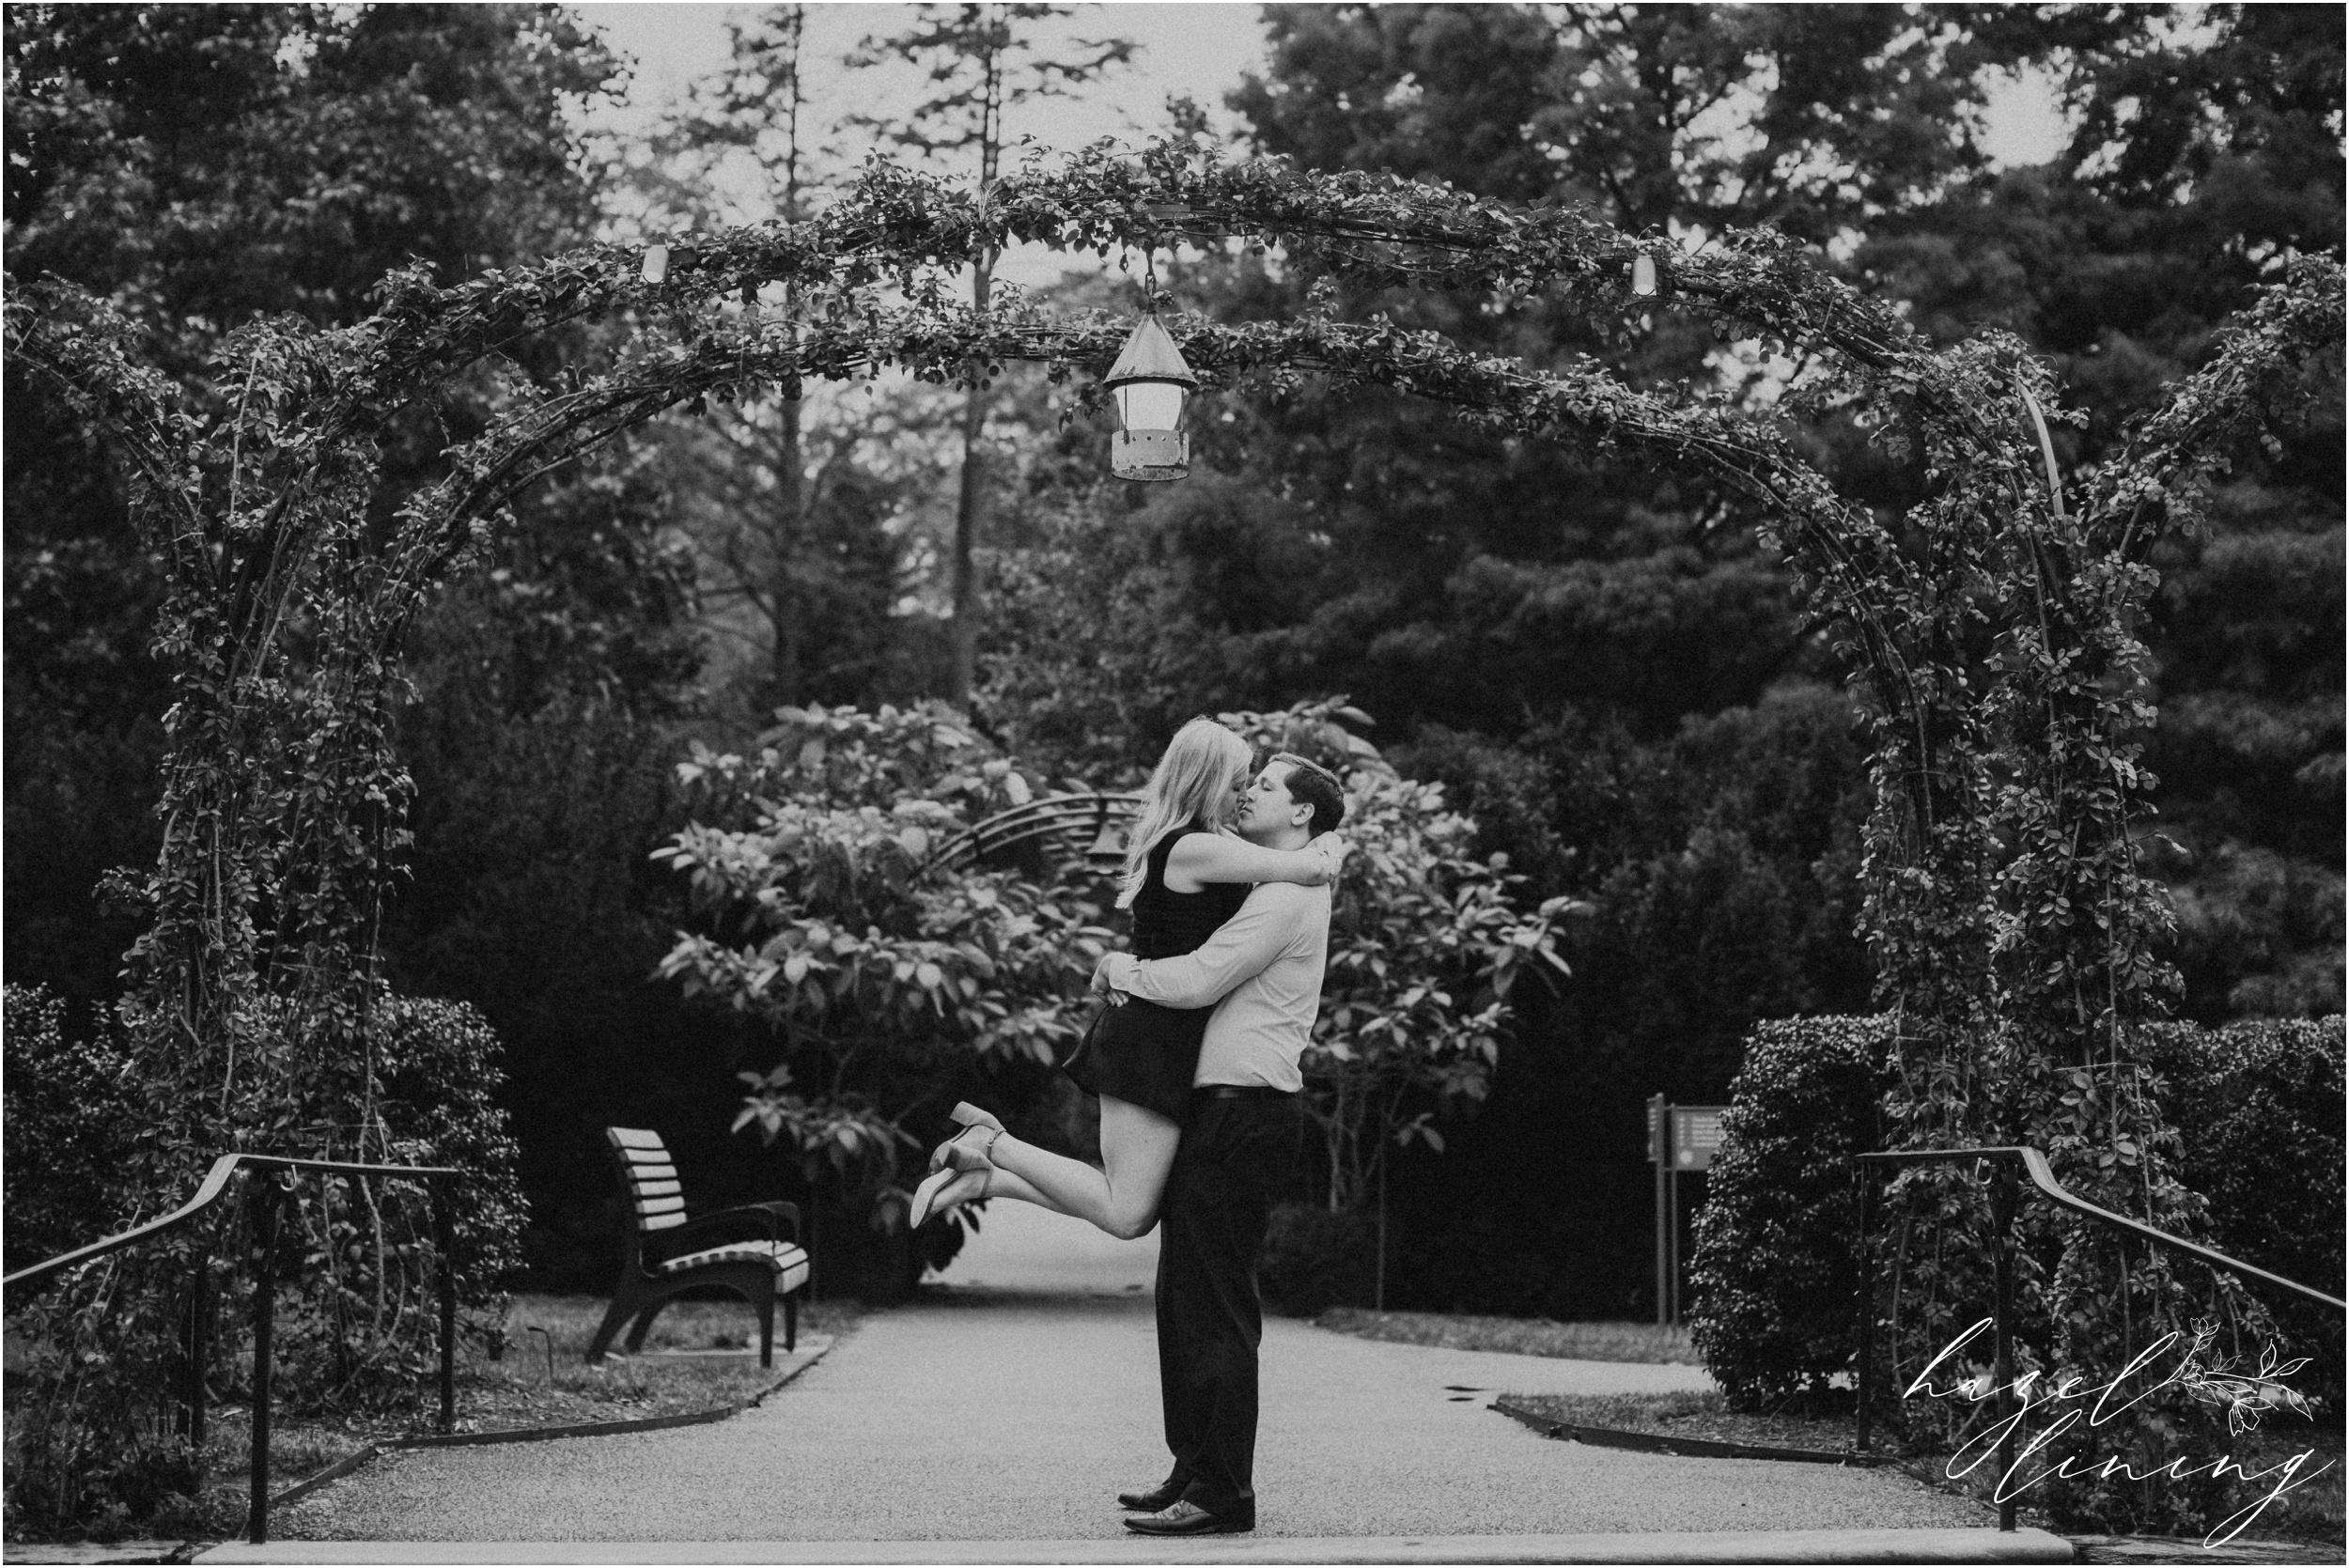 victoria-travis-logan-mayes-longwood-gardens-kennett-square-philadelphia-engagement-session-hazel-lining-photography-destination-elopement-wedding-engagement-photography_0039.jpg